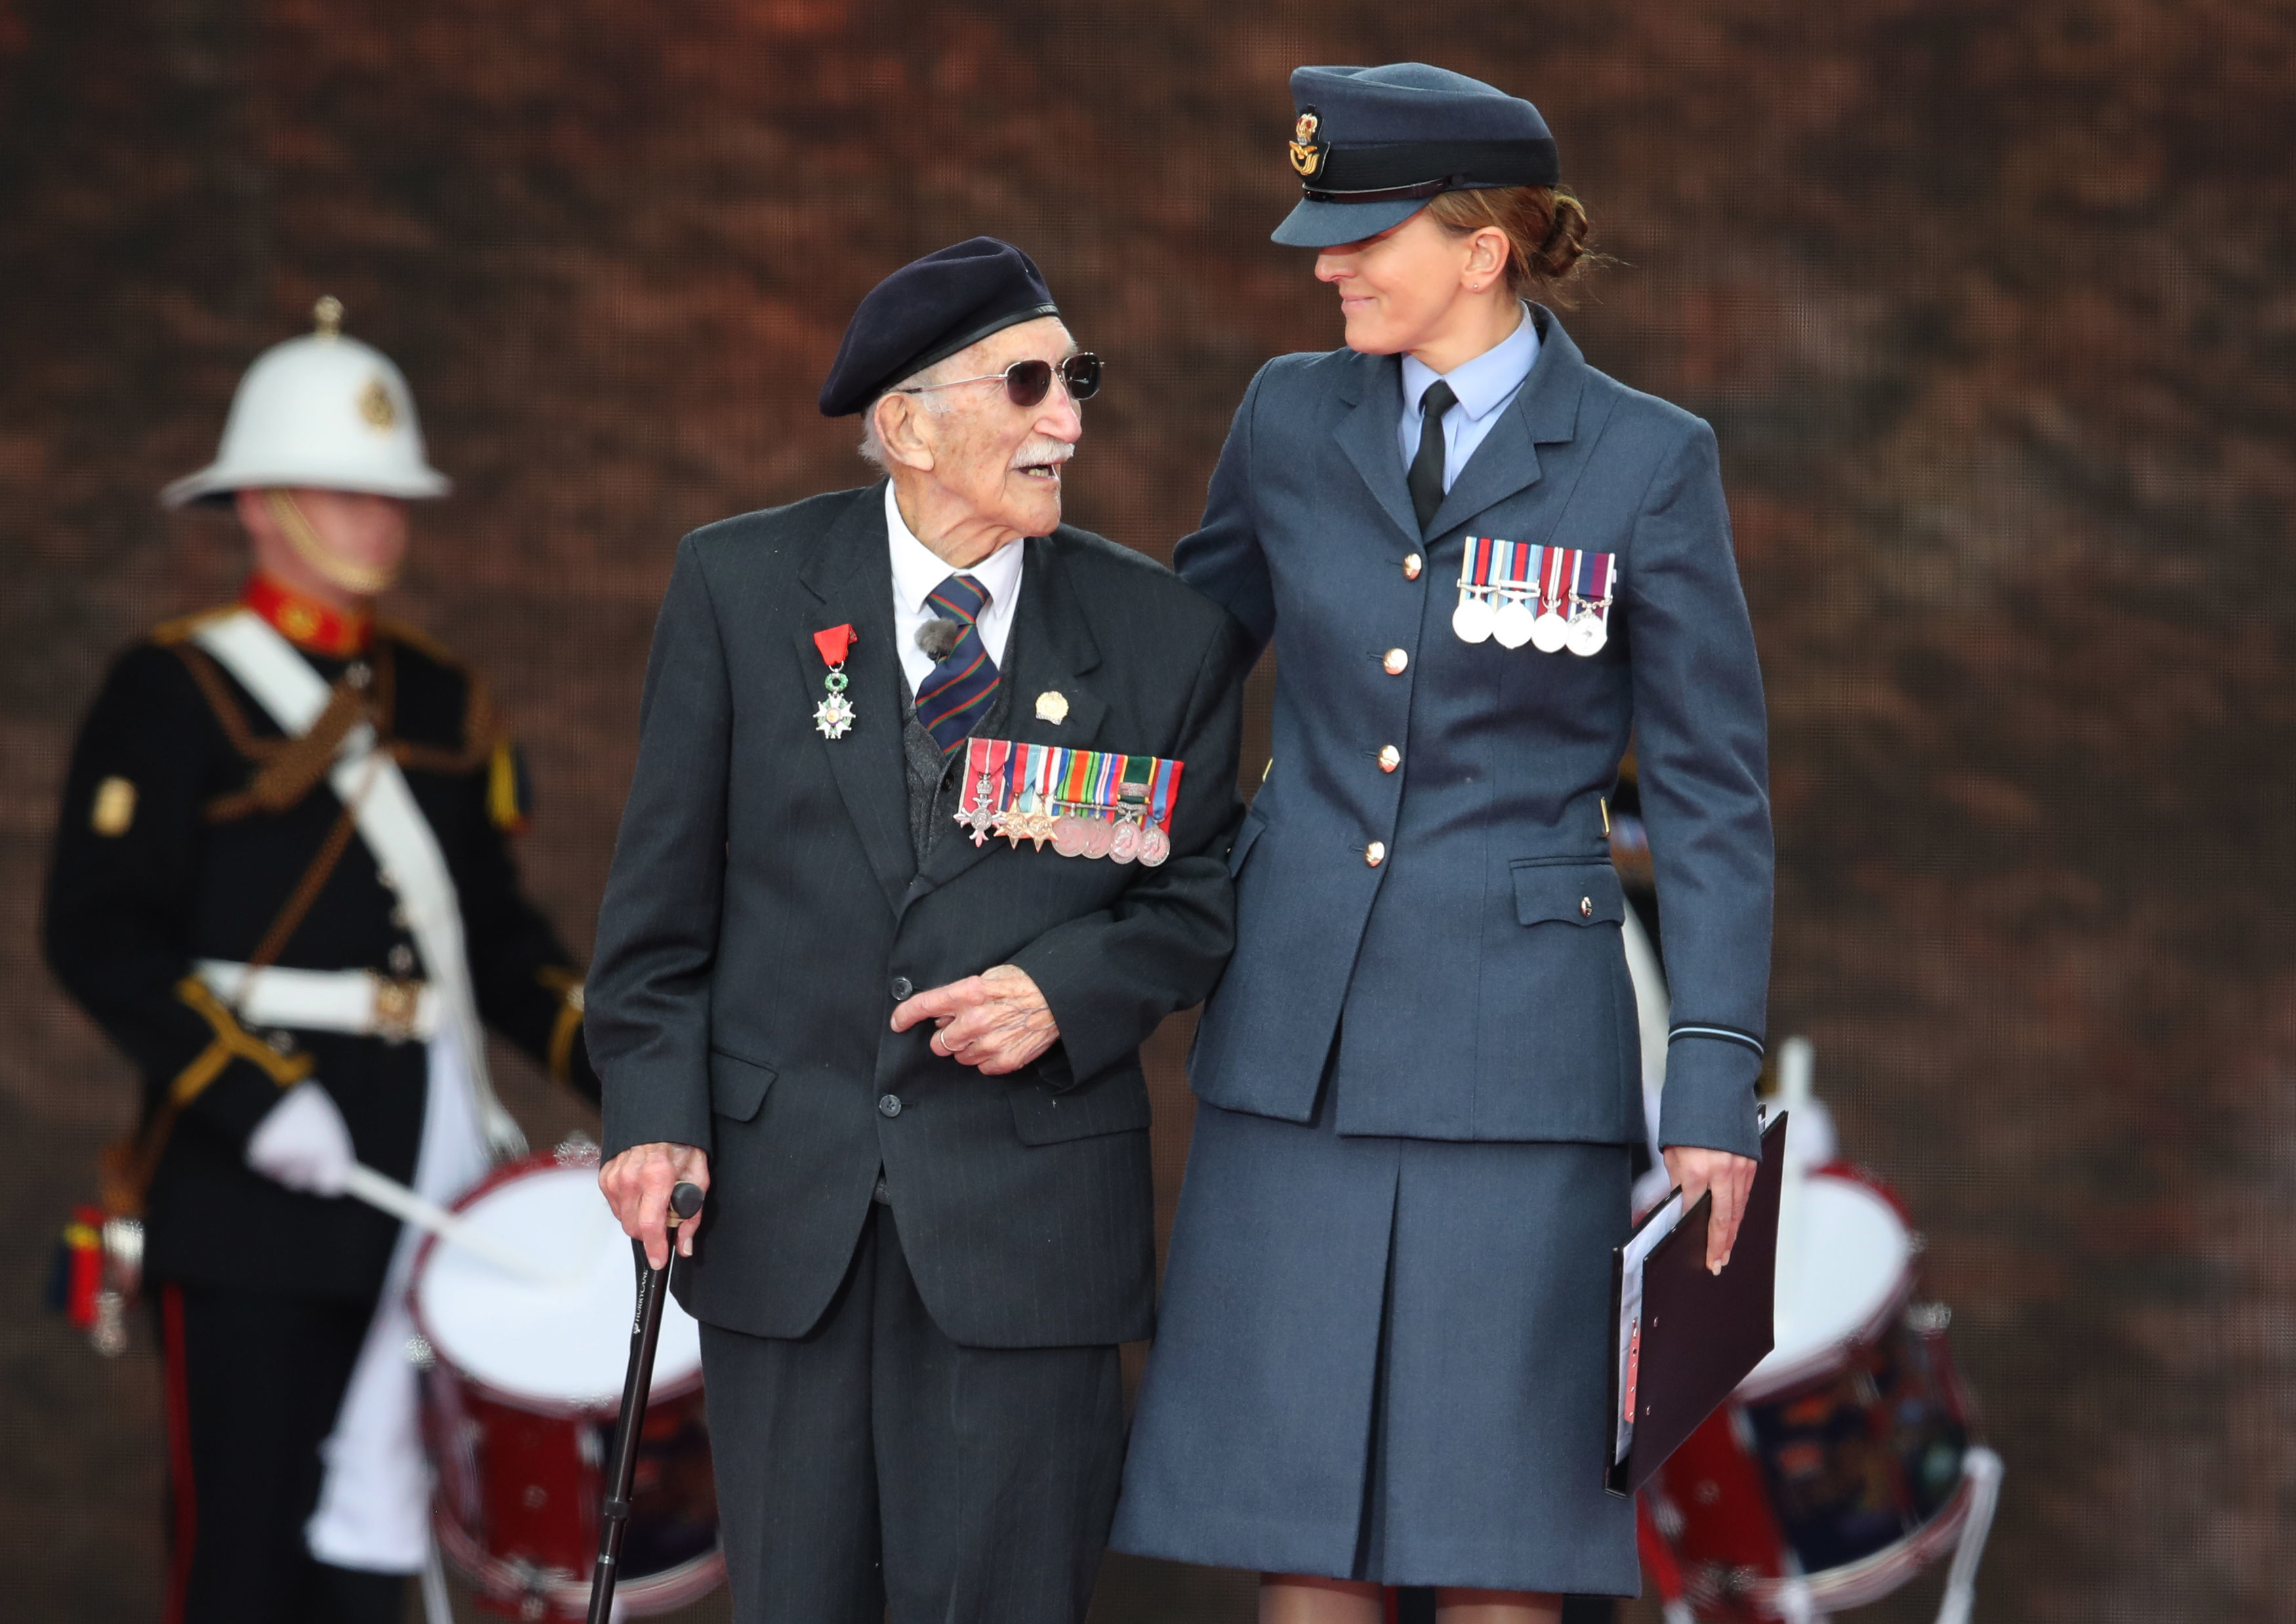 D-Day veteran John Jenkins, 99, pictured onstage.